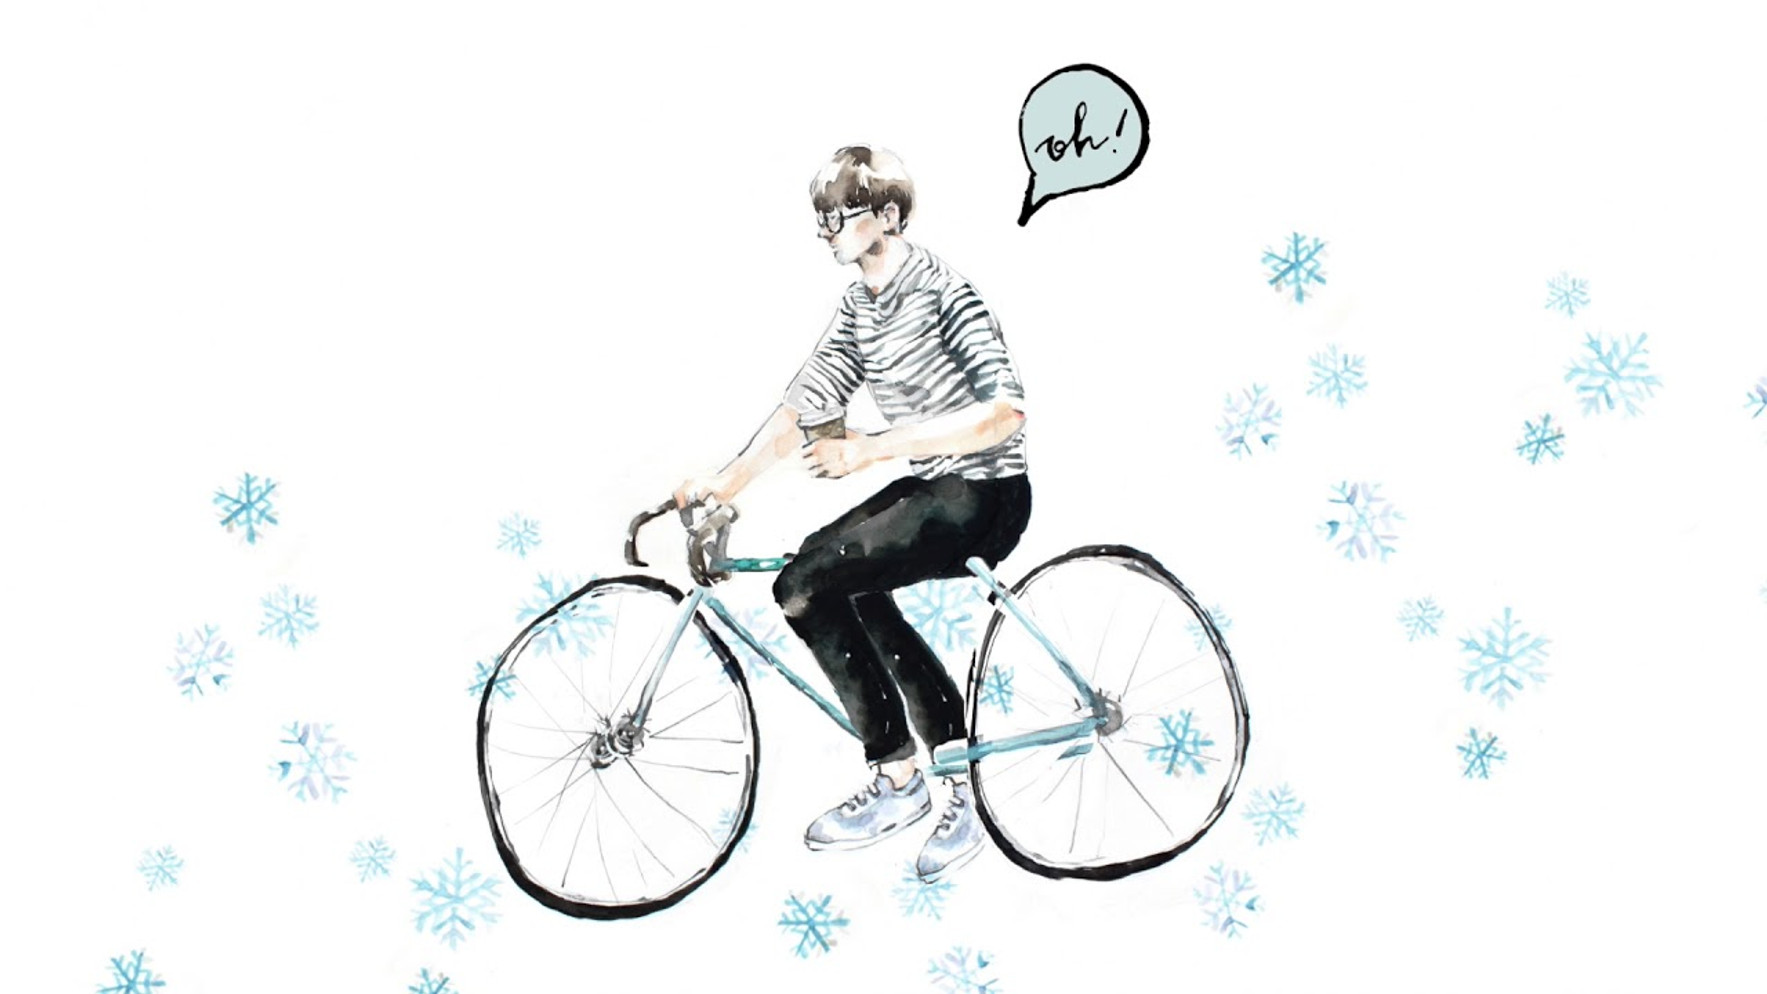 cool riding